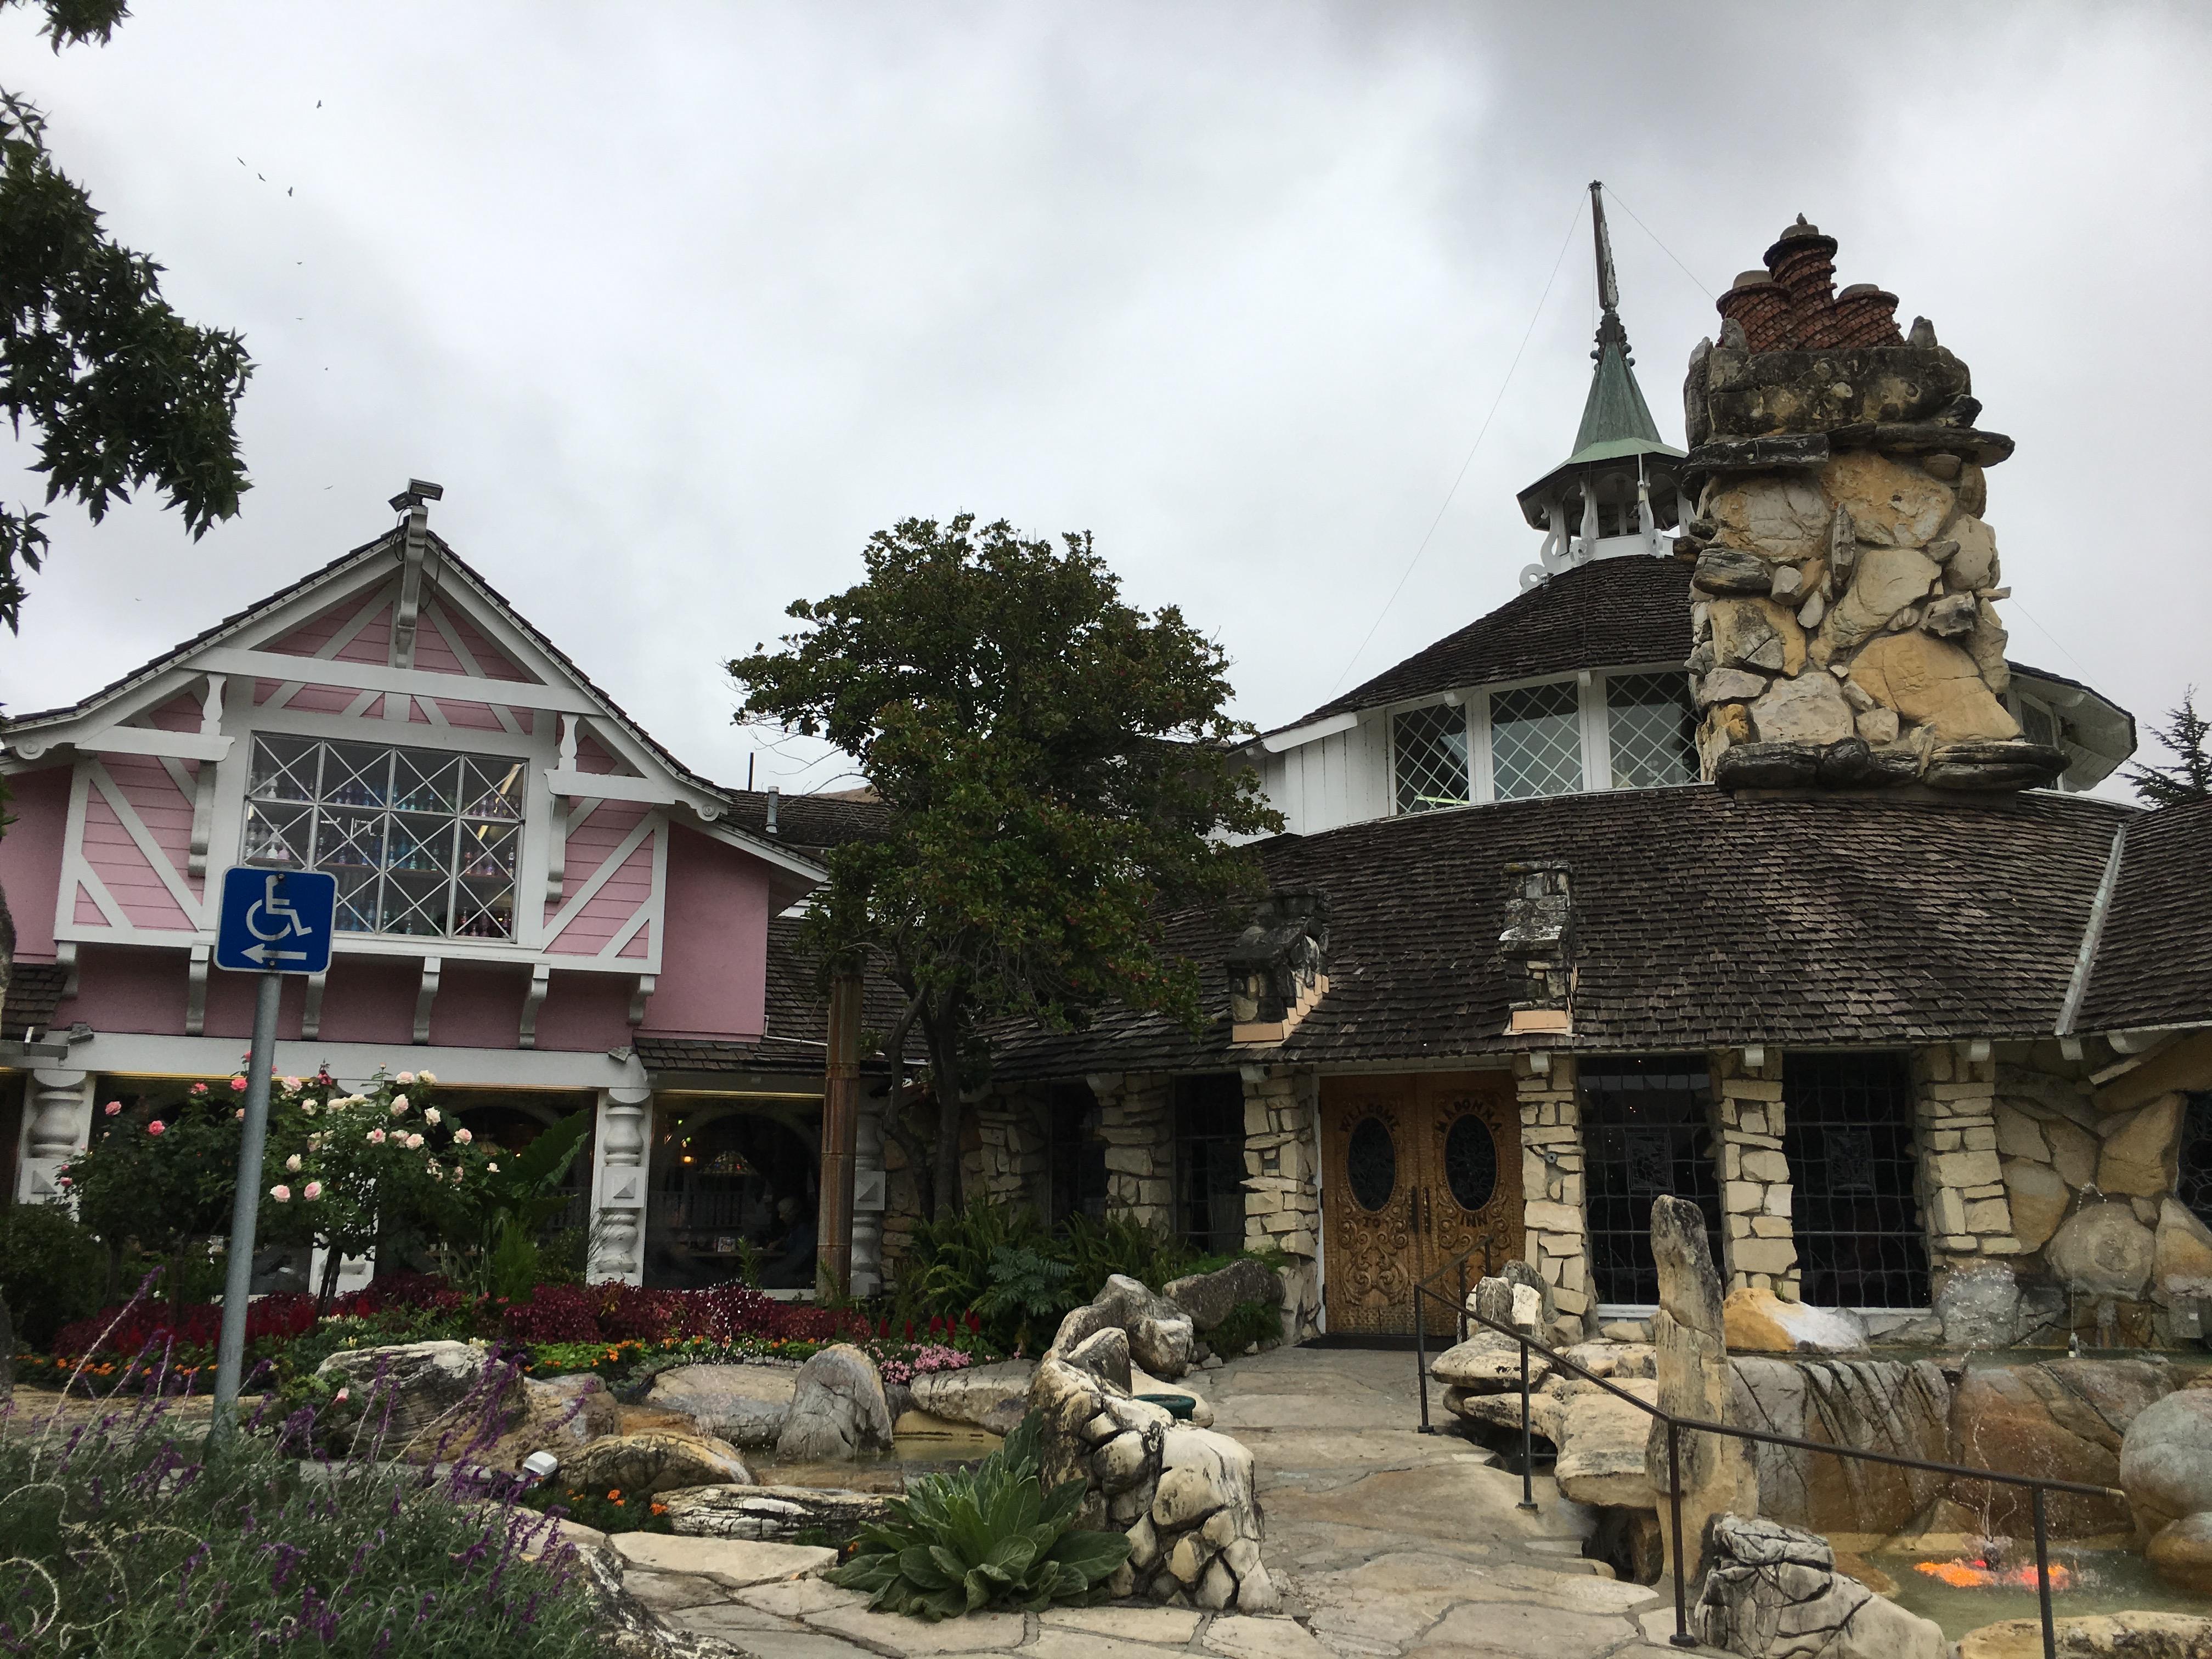 Madonna Inn - exterior